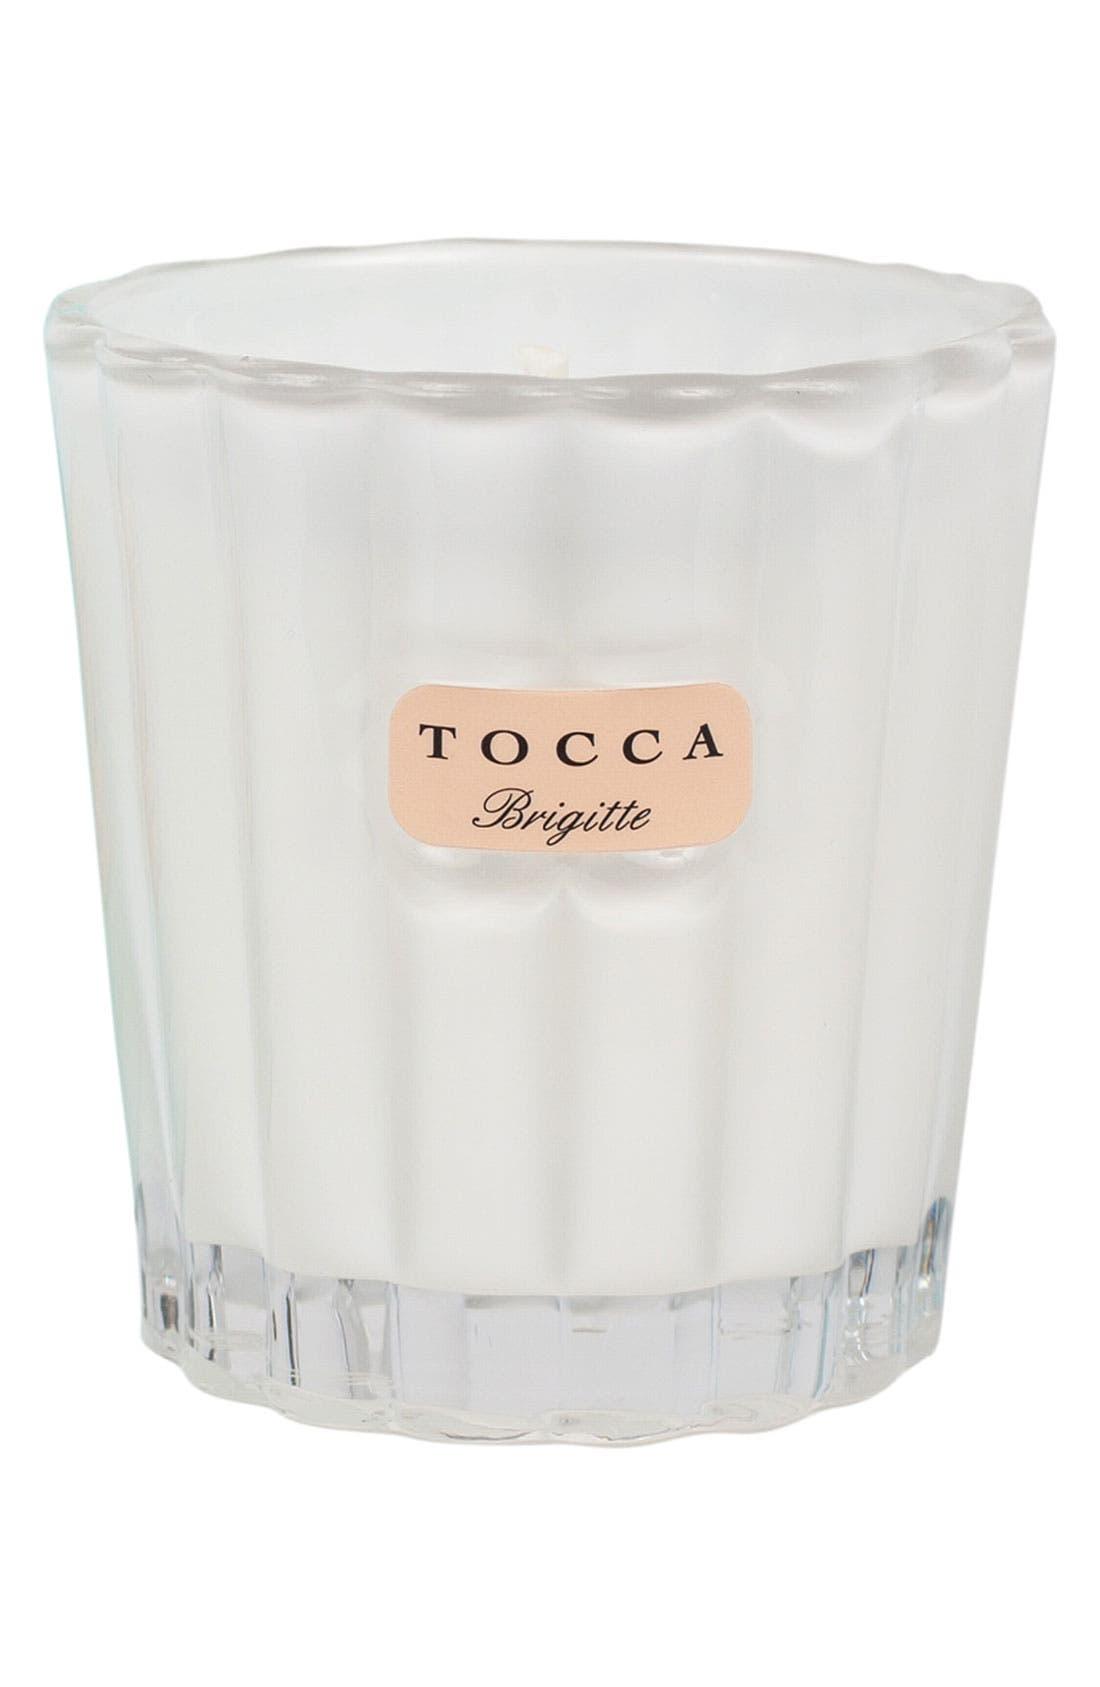 Alternate Image 1 Selected - TOCCA 'Brigitte' Candelina